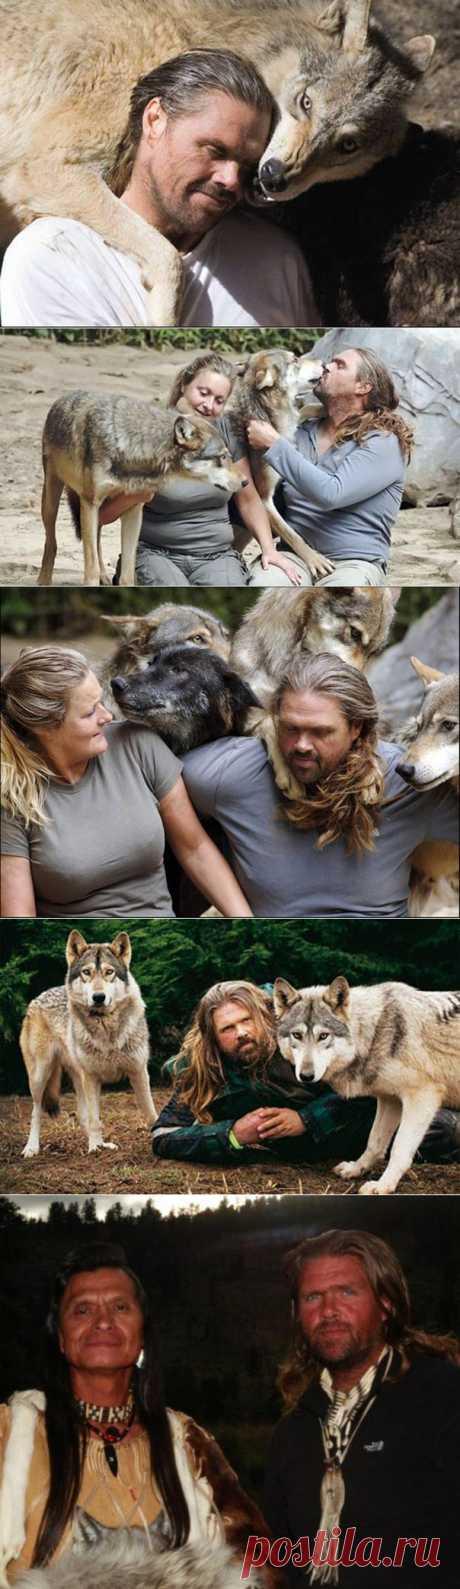 Leena - Шон Эллис - человек волк